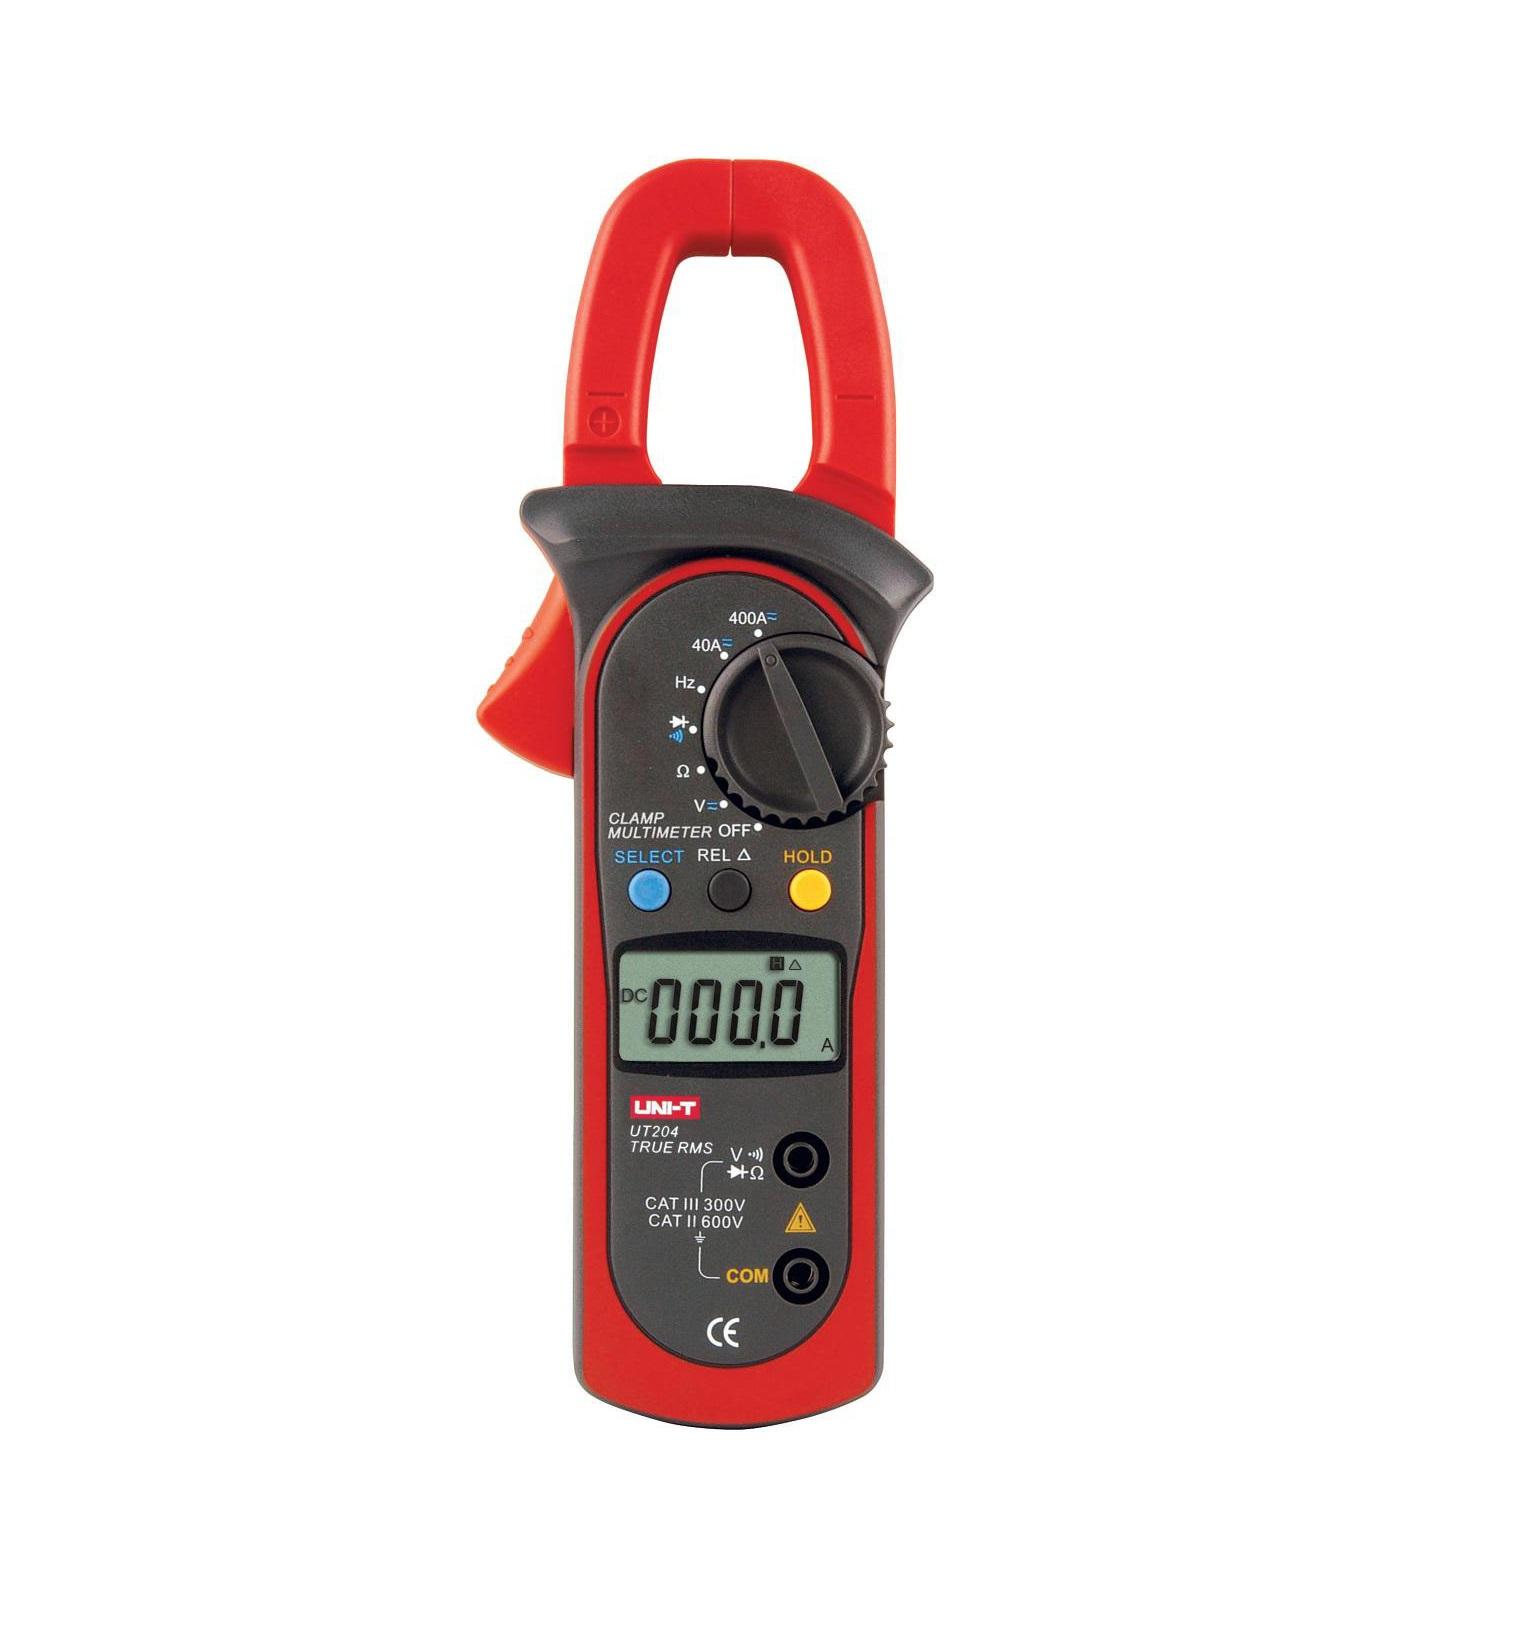 UNI-T UT204 - Digital Clamp Meters True RMS 600A  400mV-600V